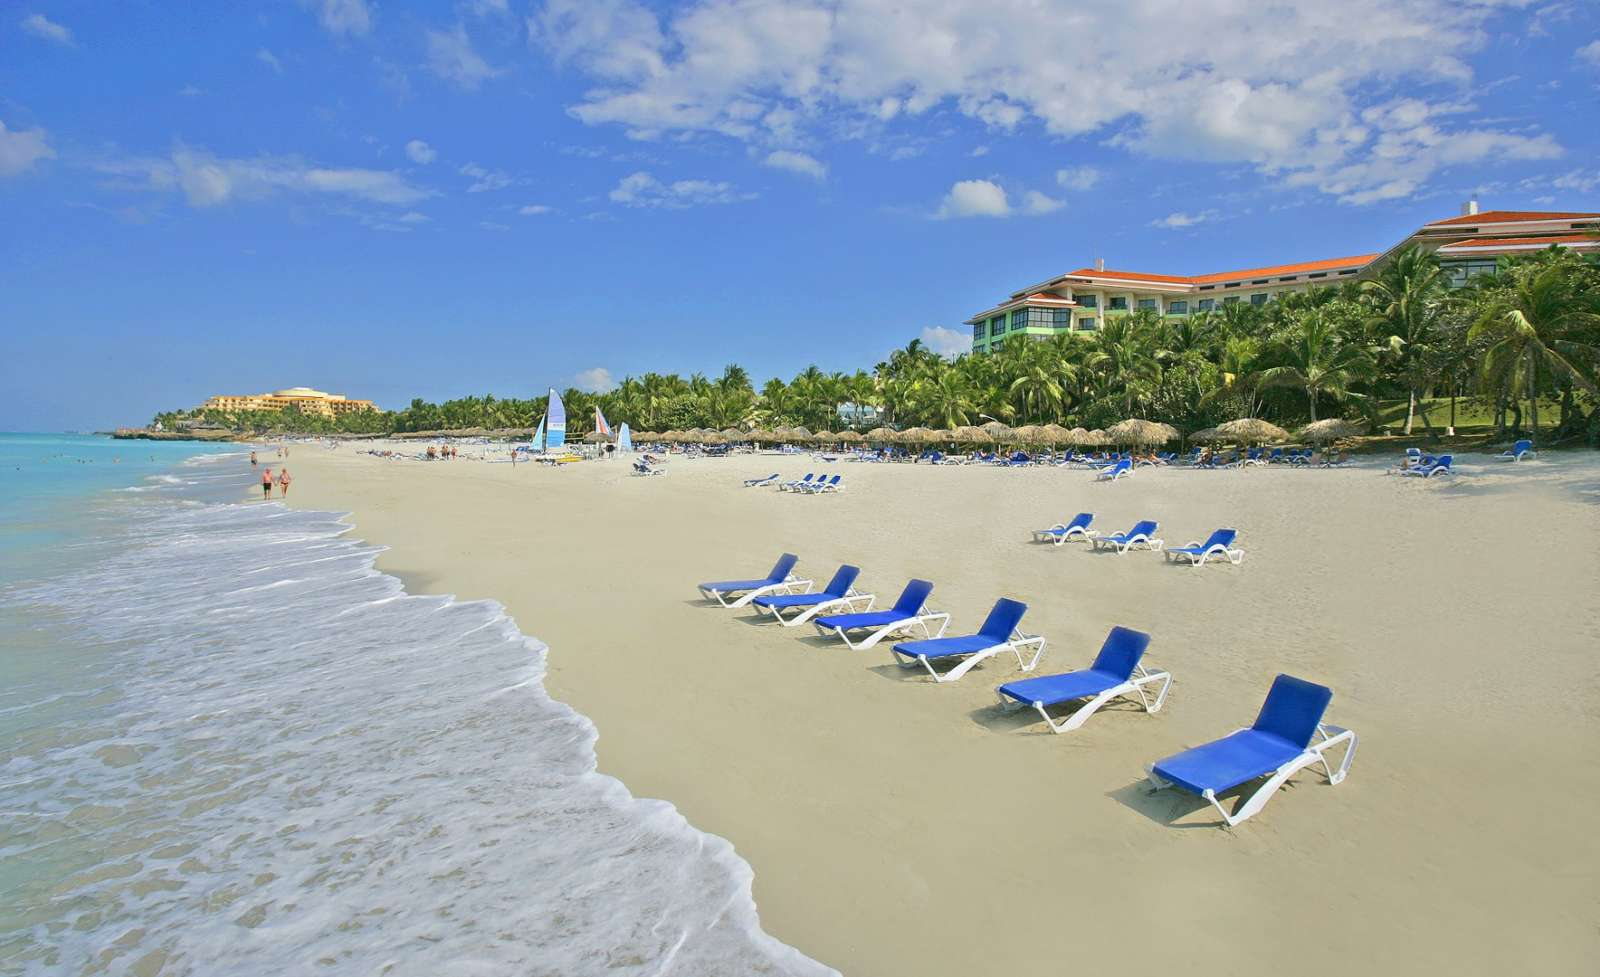 Melia Las Americas beach and loungers